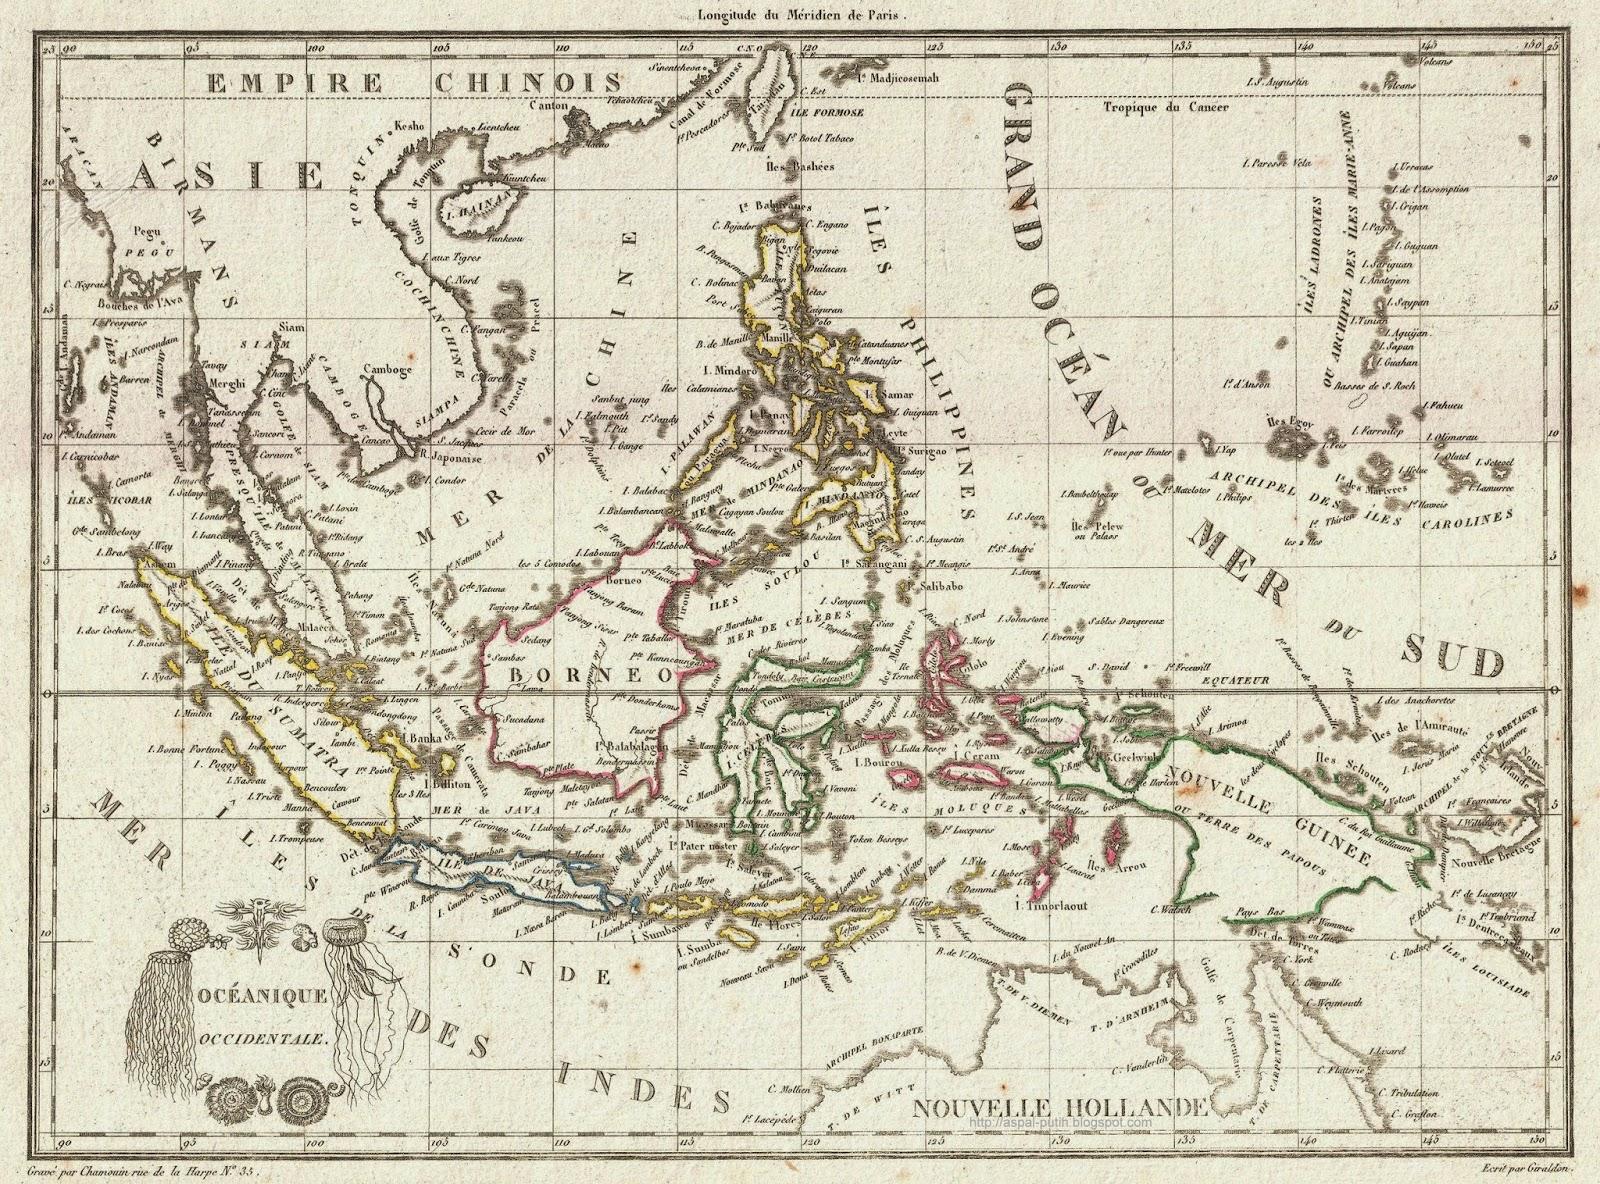 Peta Kuno Dan Foto Zaman Penjajahan